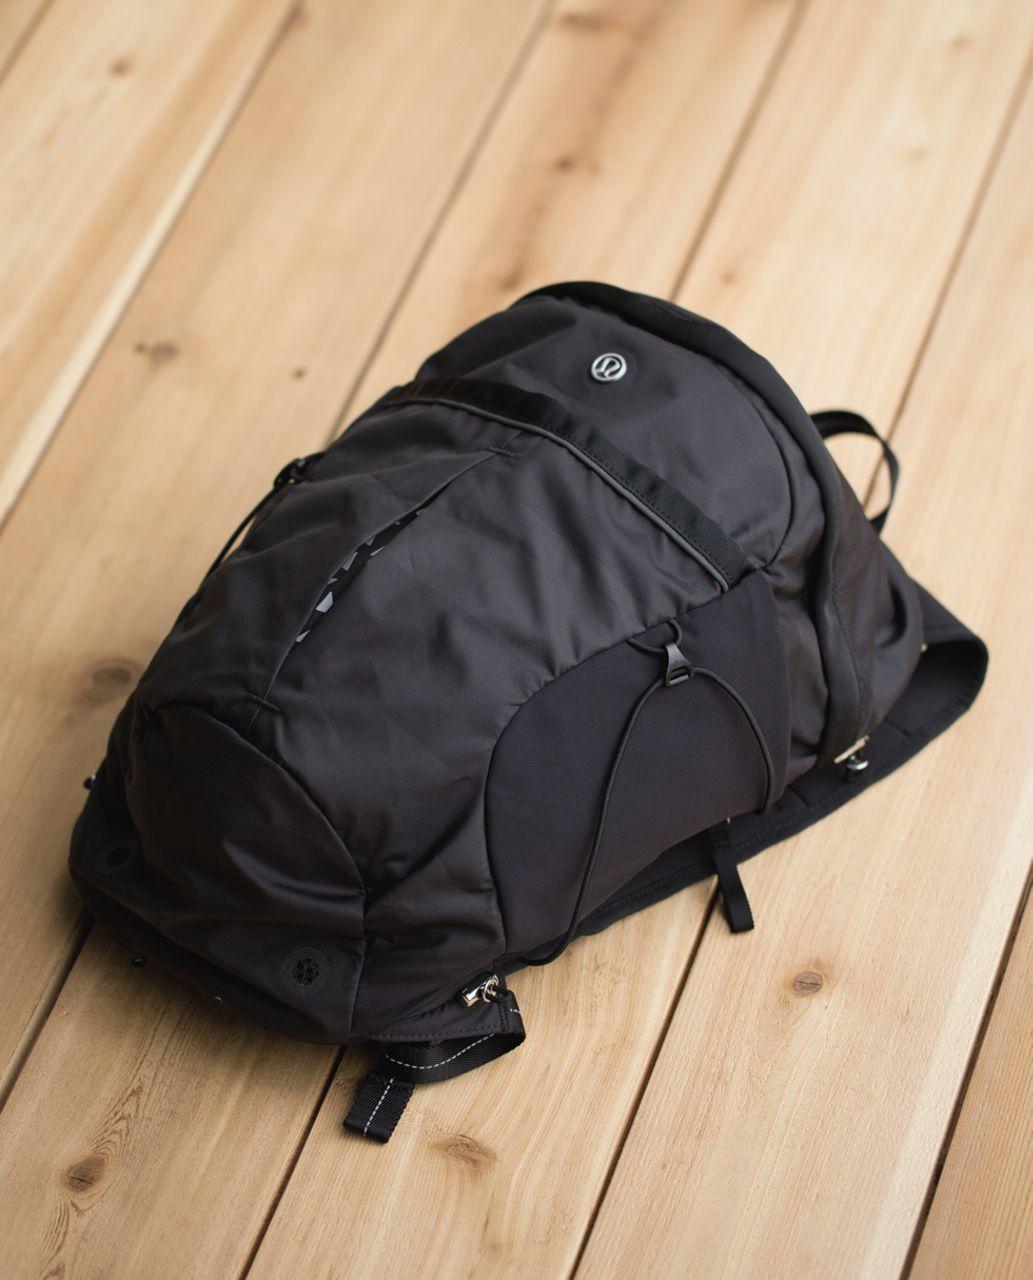 Lululemon Run All Day Backpack - Wide Bold Stripe Black Deep Coal / Black